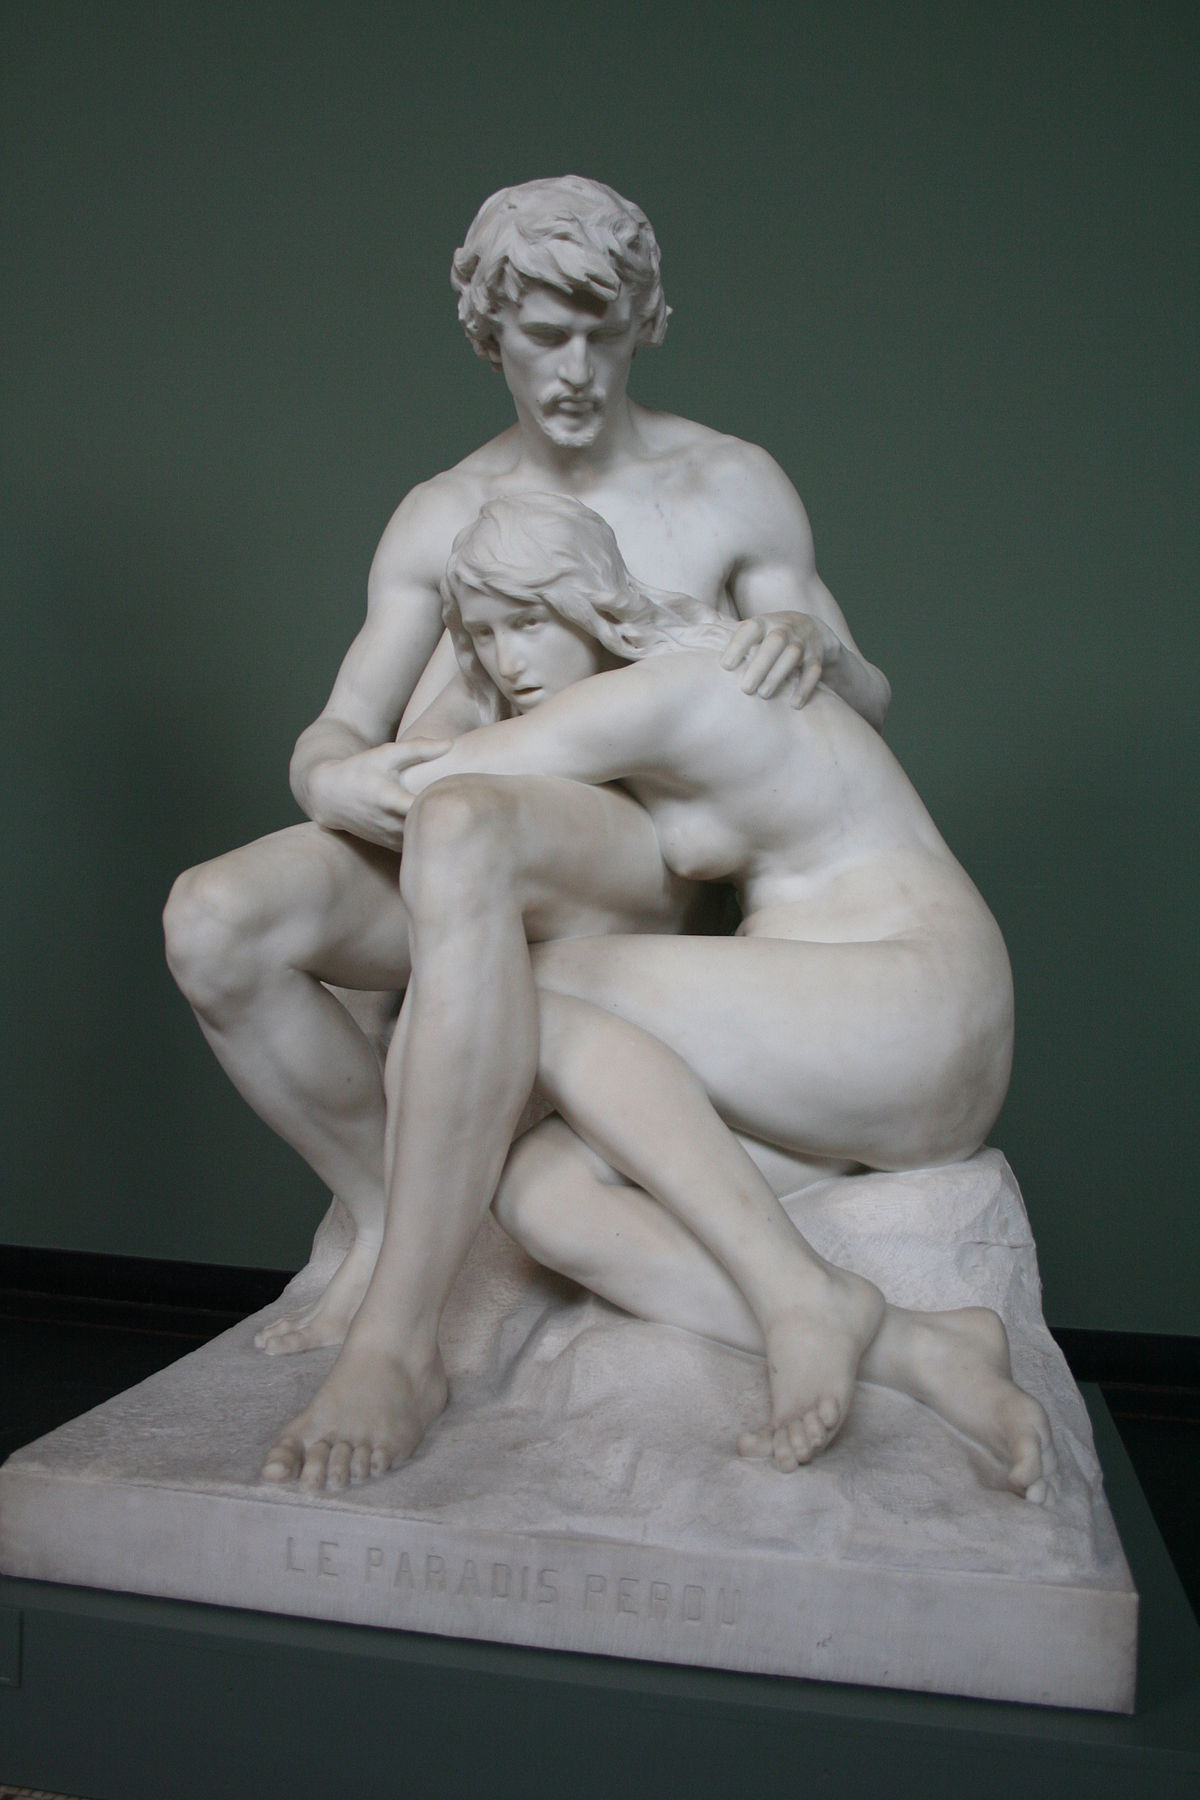 Statue fuck 2 - 1 part 2